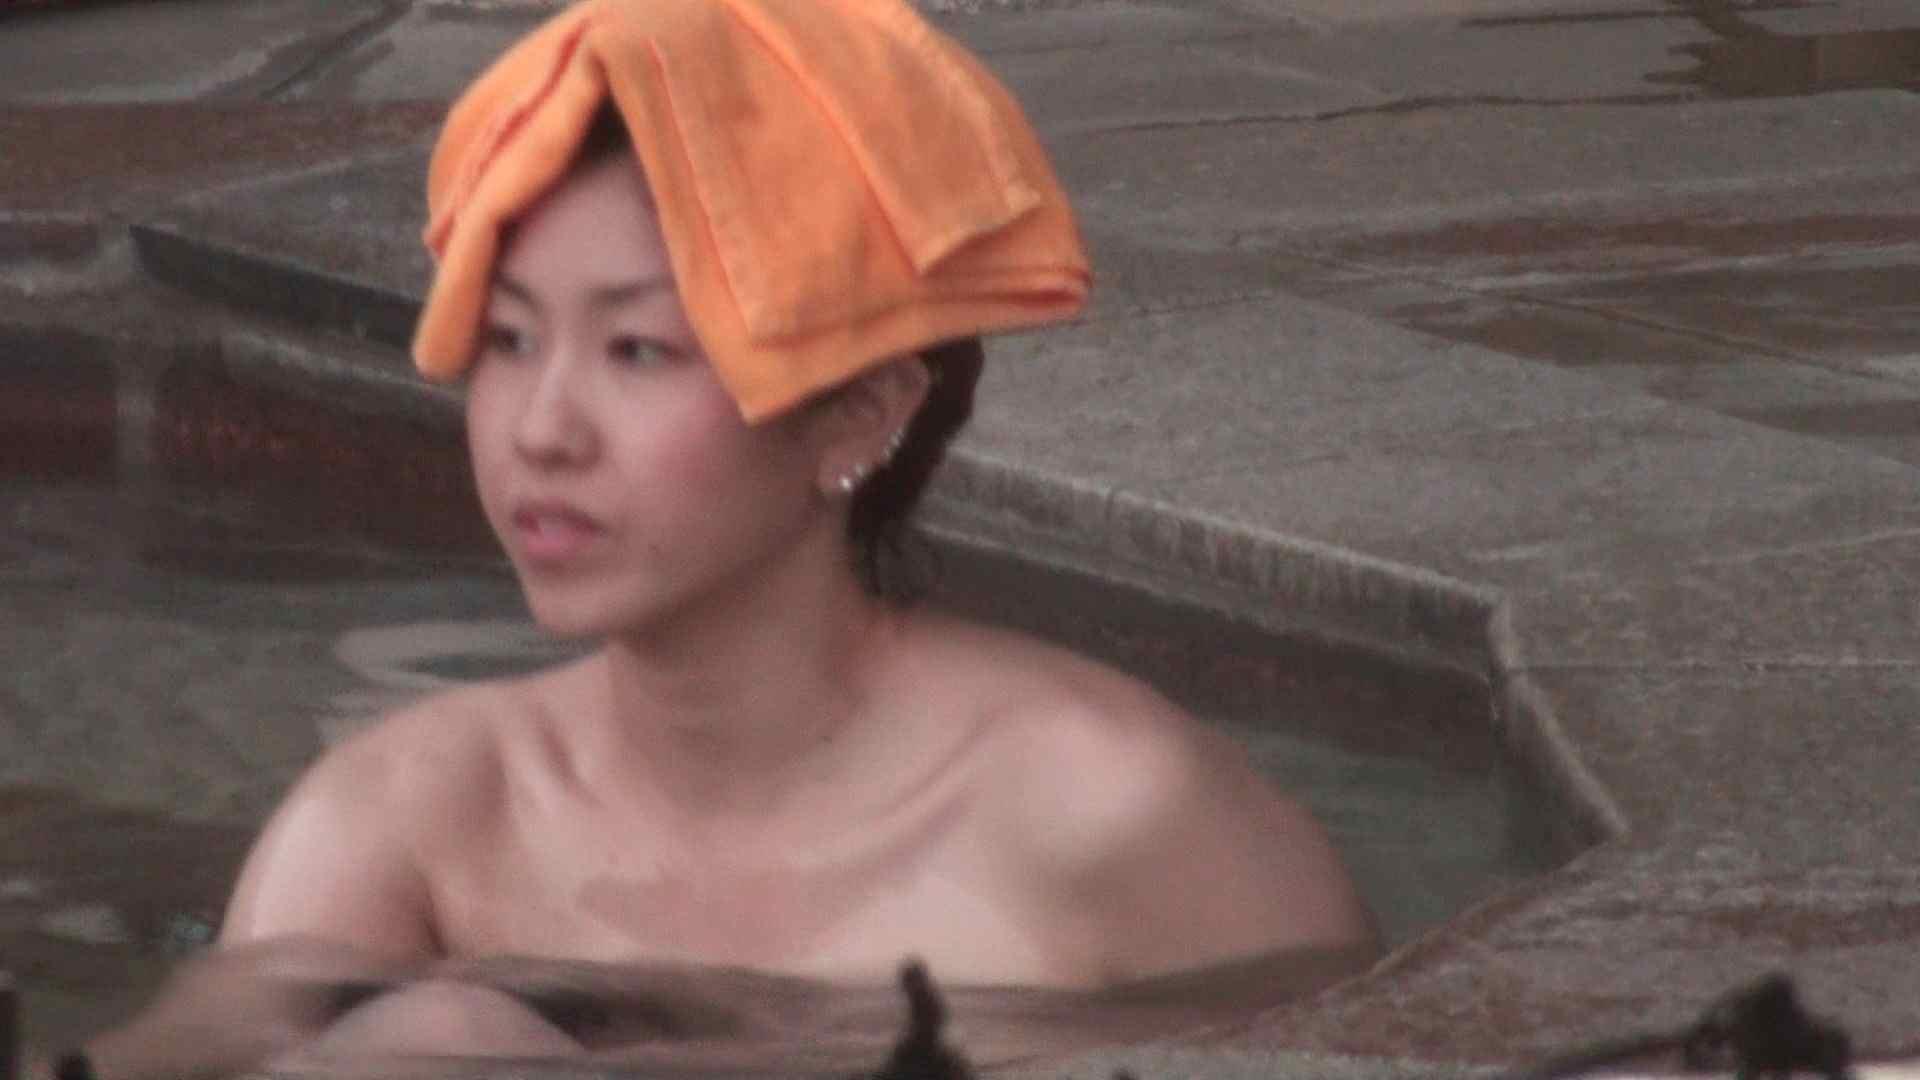 Aquaな露天風呂Vol.135 盗撮師作品  105pic 75